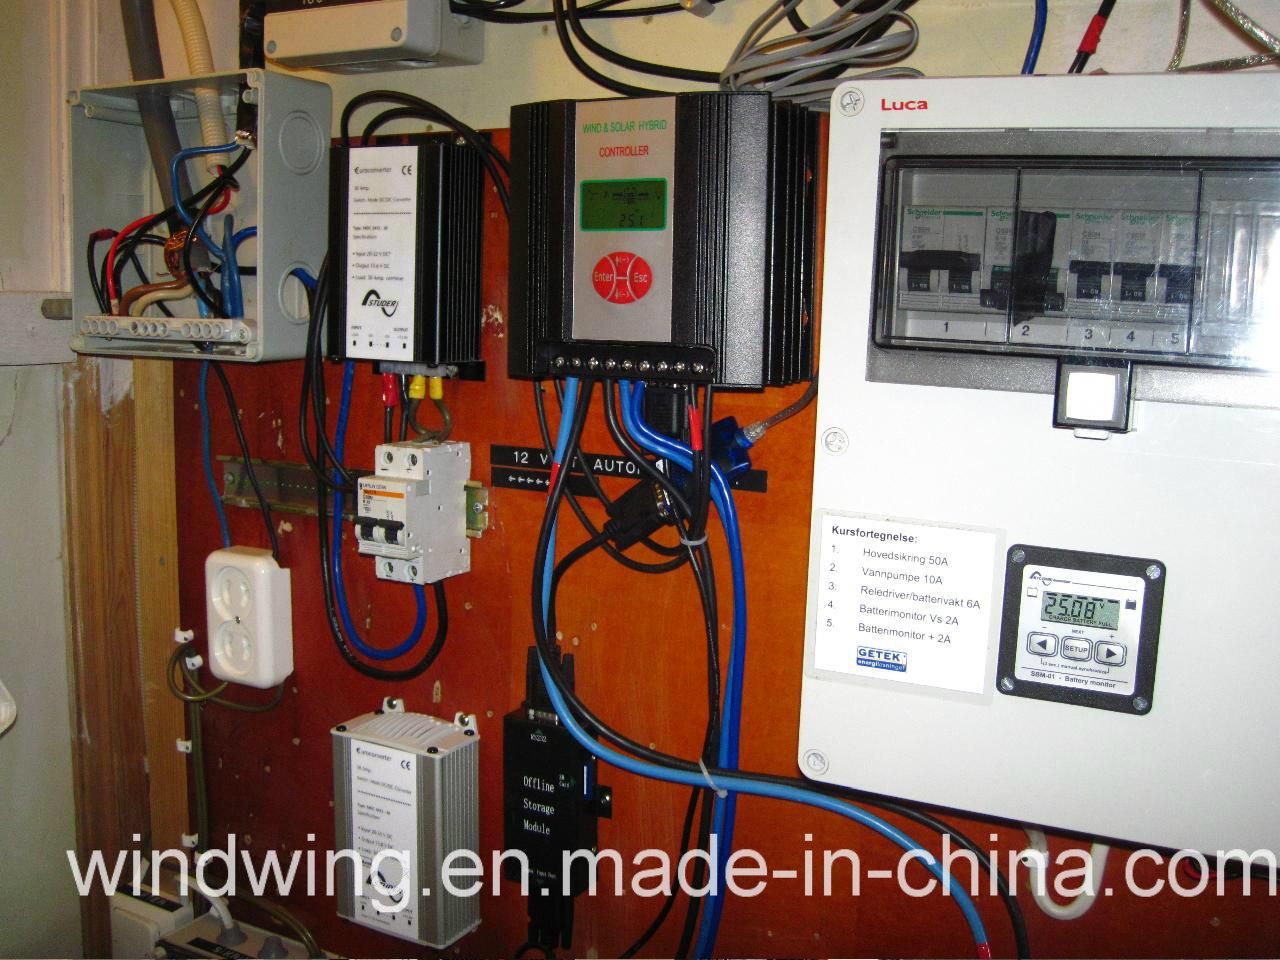 China 600w Magnet Wind Turbine Generator For Water Pump 200w 5kw Home Wiring Basics